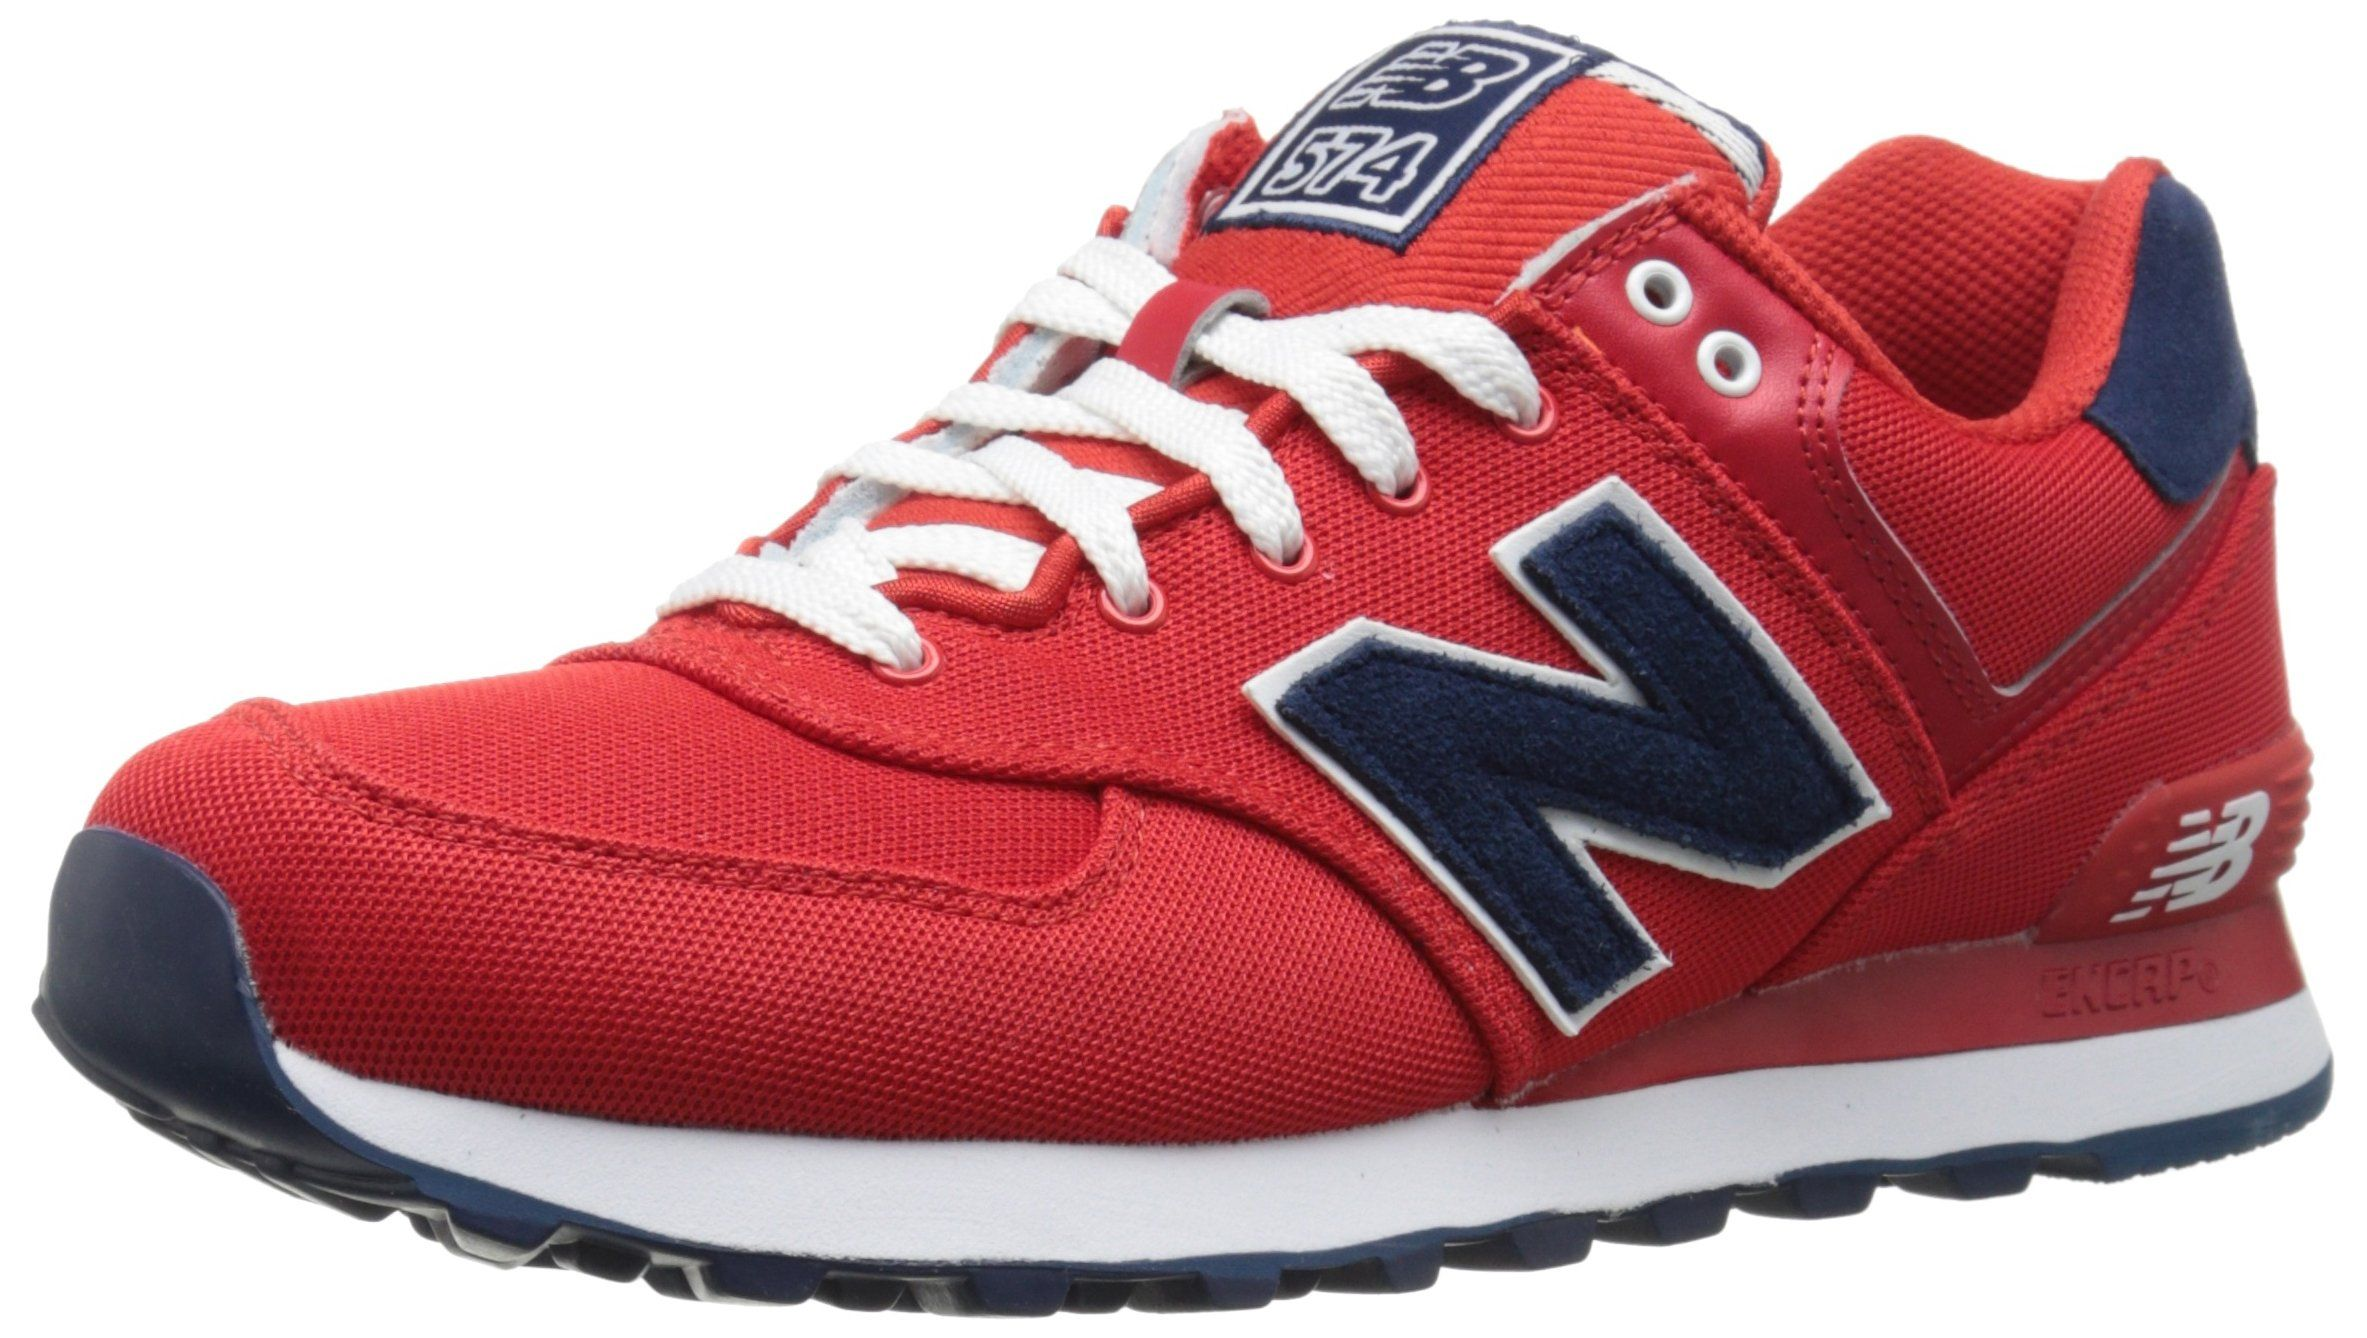 Amazon Com New Balance Women S Wl574 Pique Polo Collection Running Shoe Clothing New Balance New Balance Walking Shoes New Balance 574